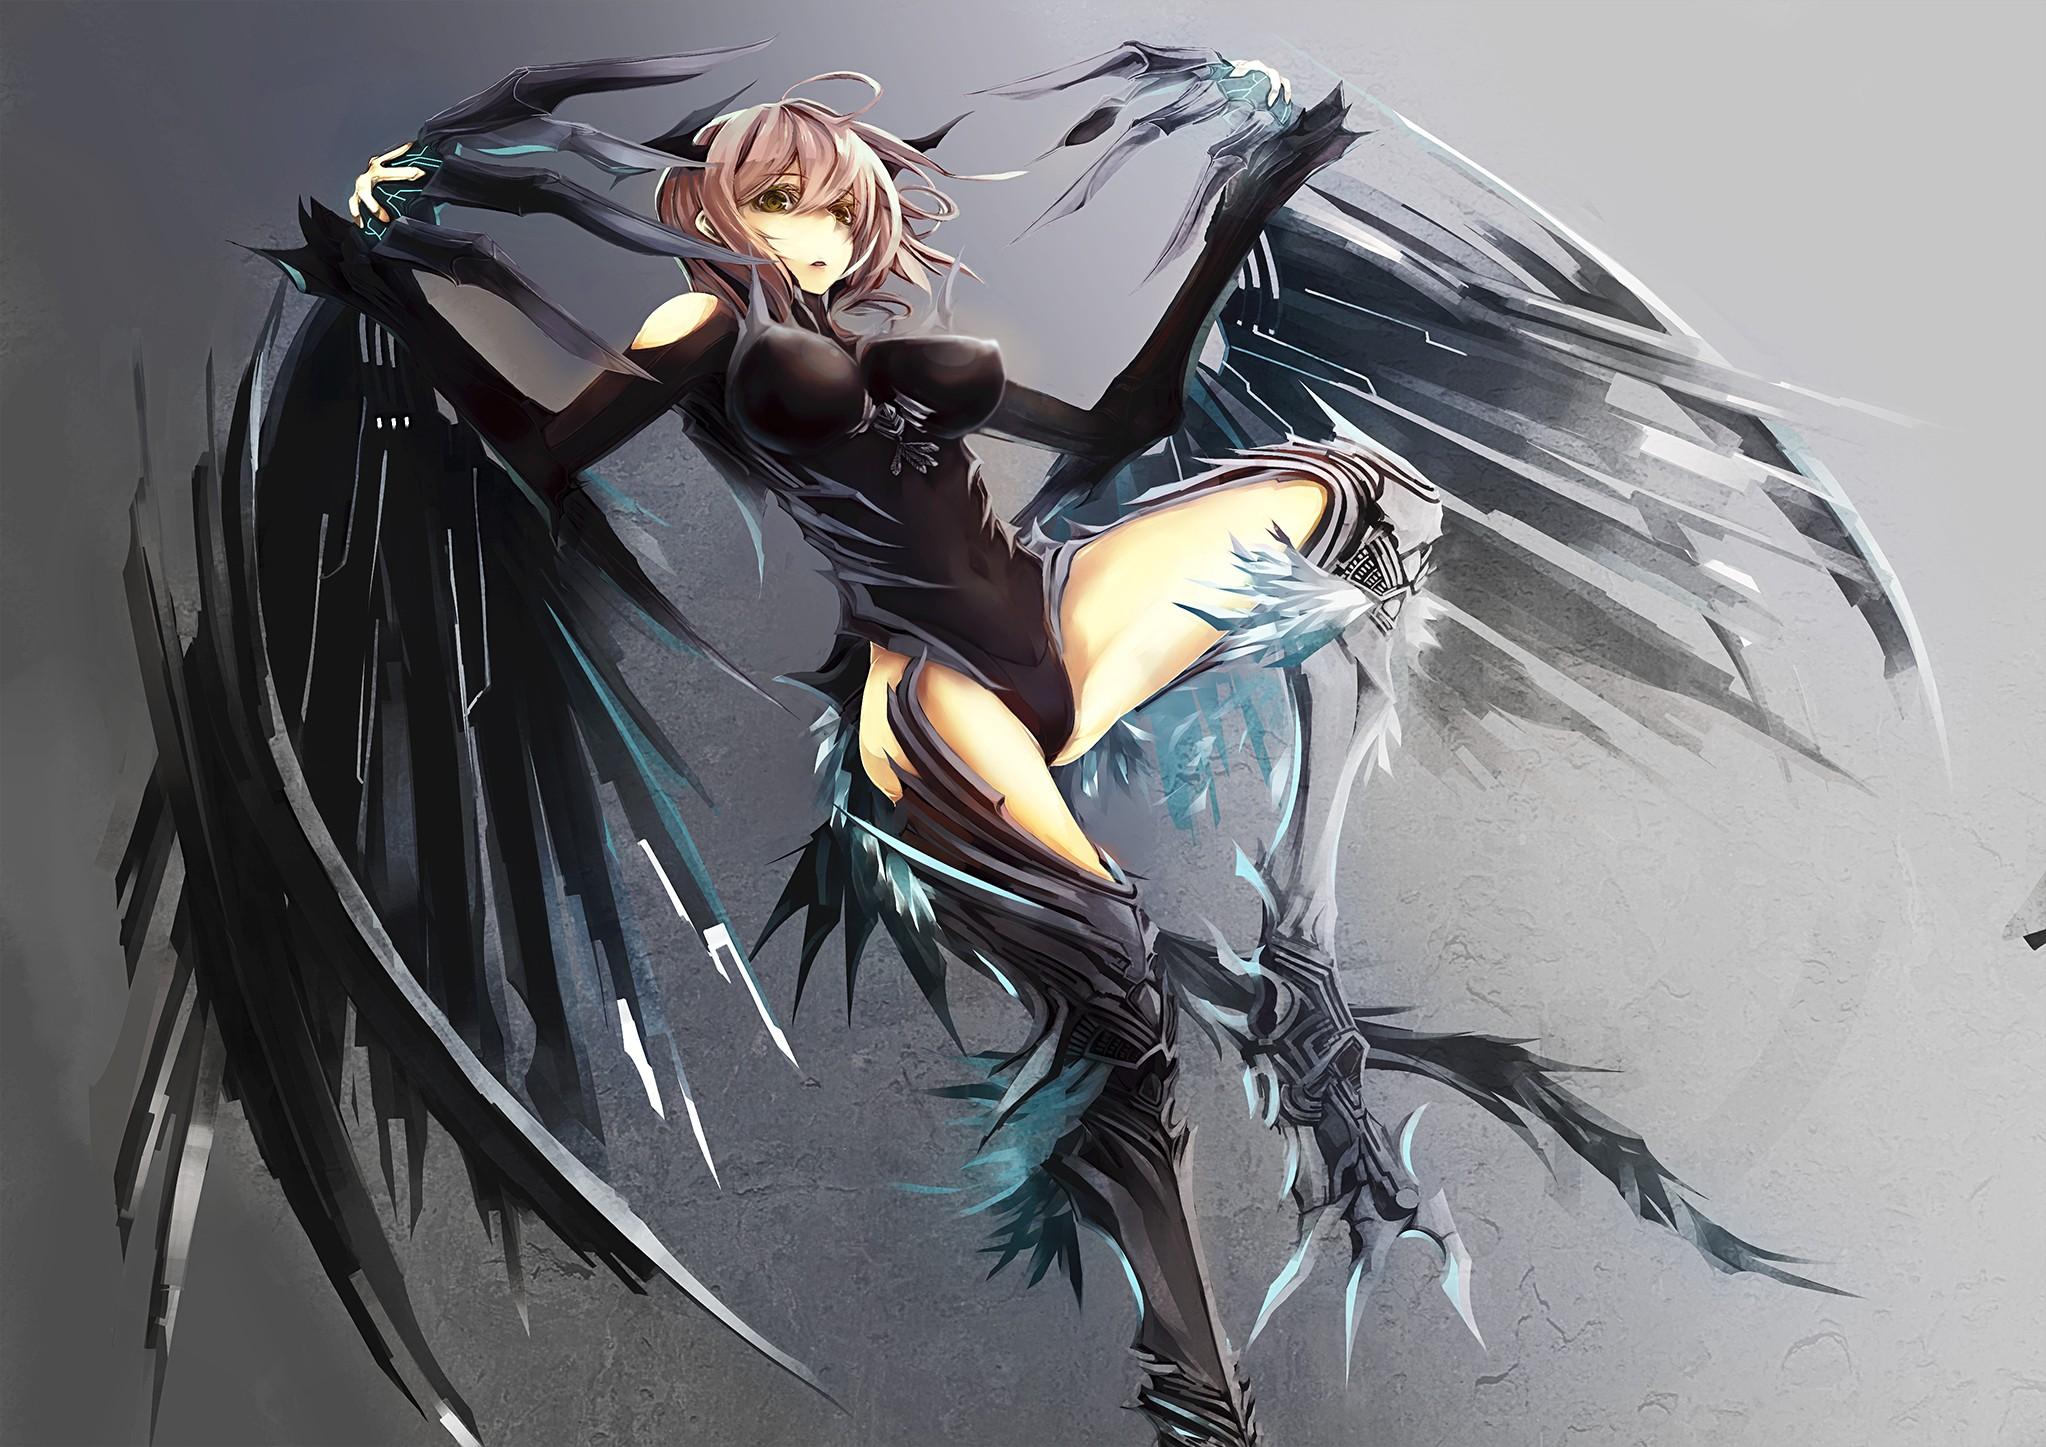 Wallpaper Gambar Ilustrasi Gadis Anime Sayap Payudara